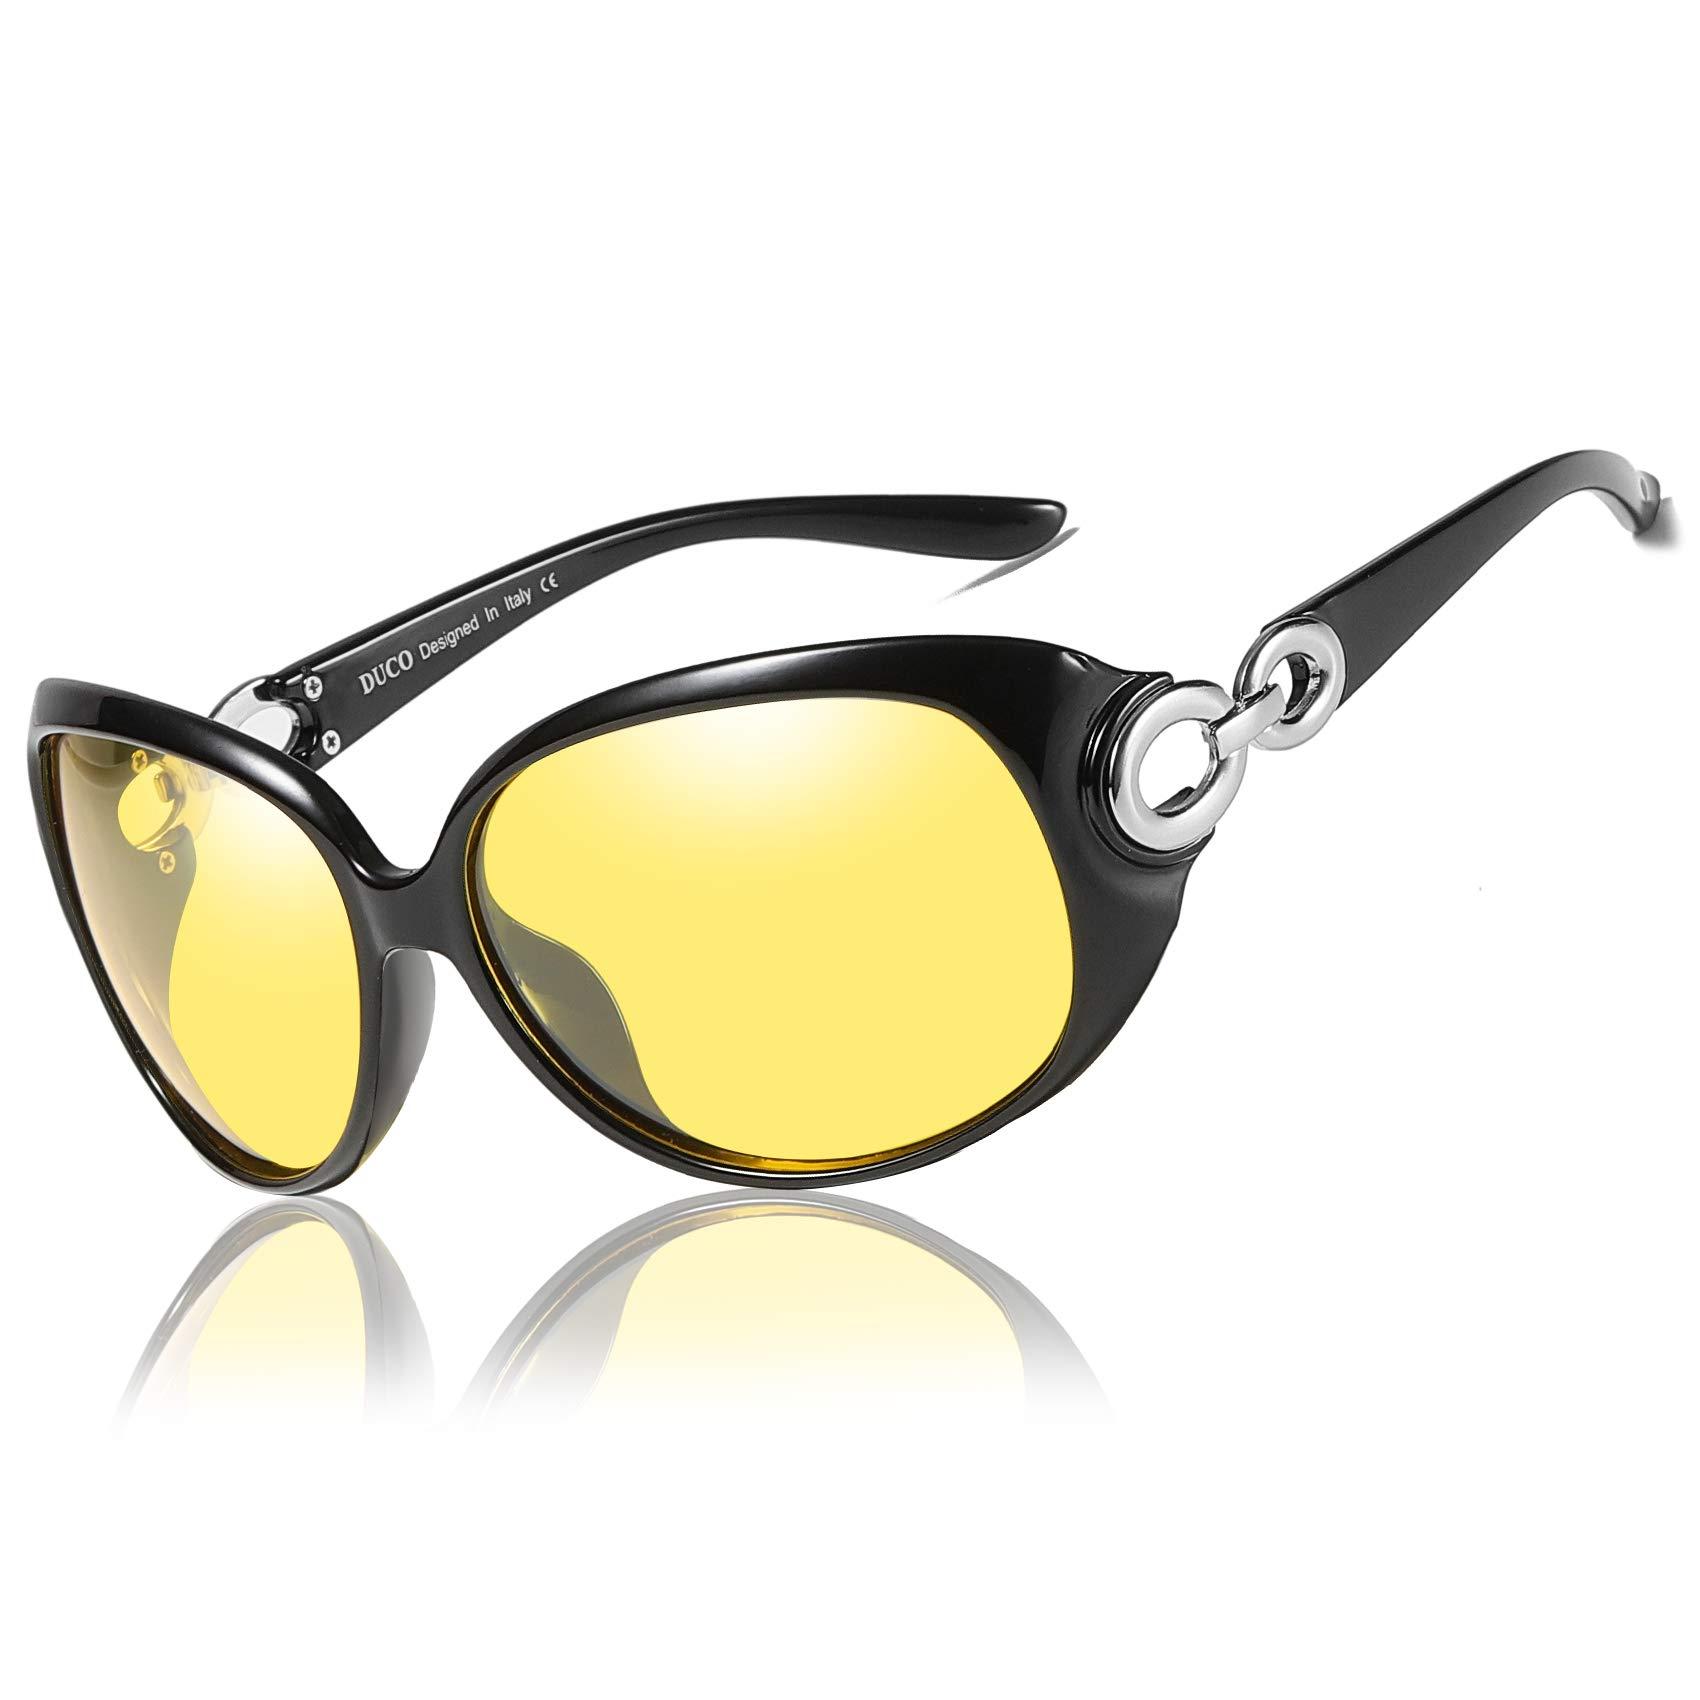 Duco Driving Glasses Anti glare Polarized